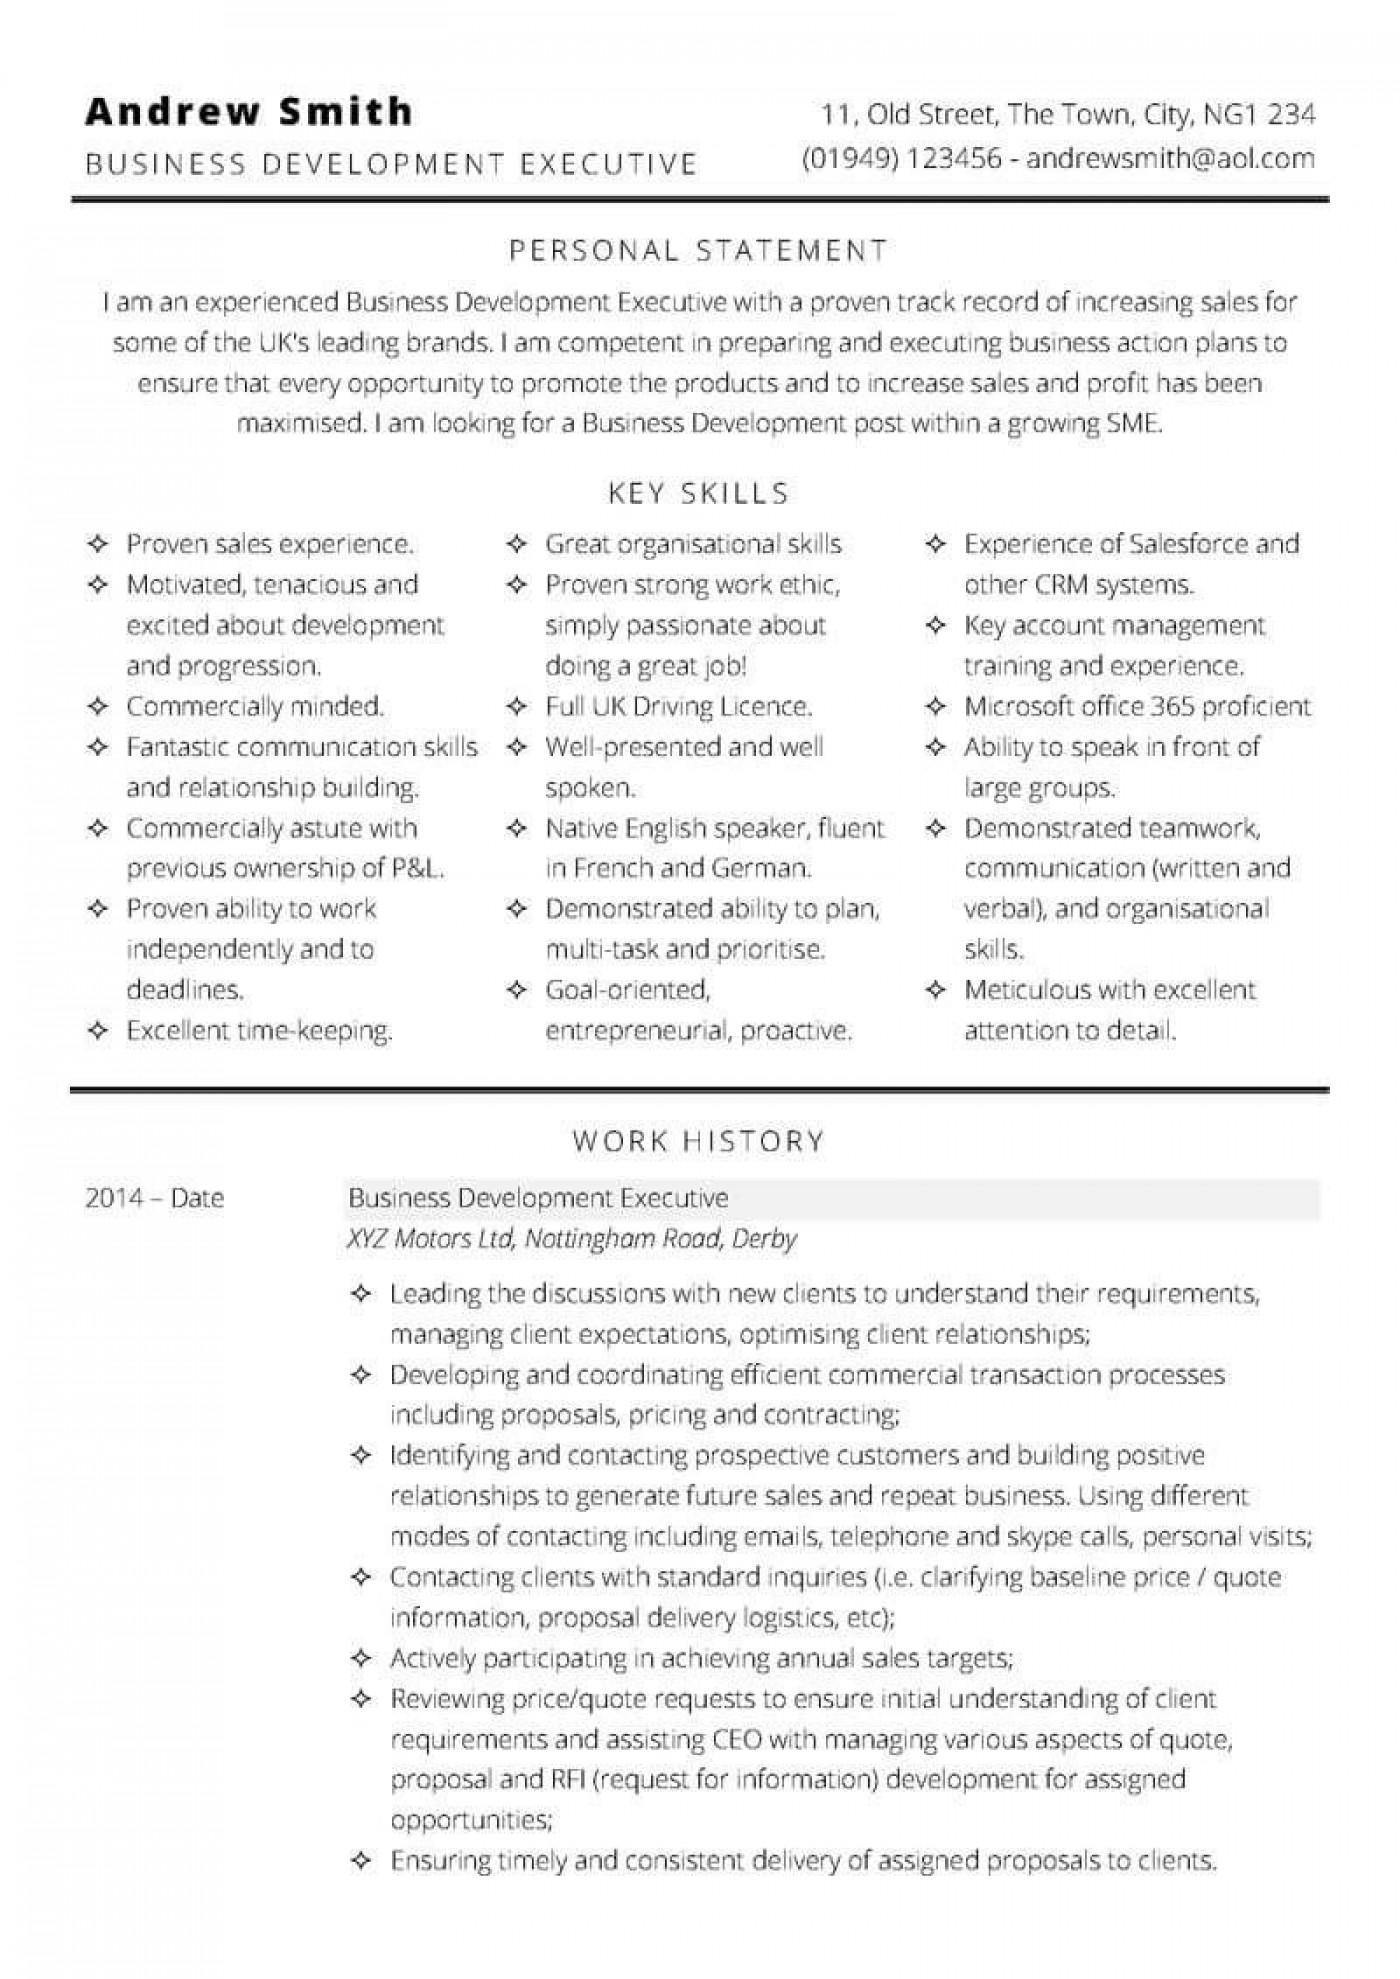 003 Fascinating Skill Based Resume Template Word High Def  Microsoft1400